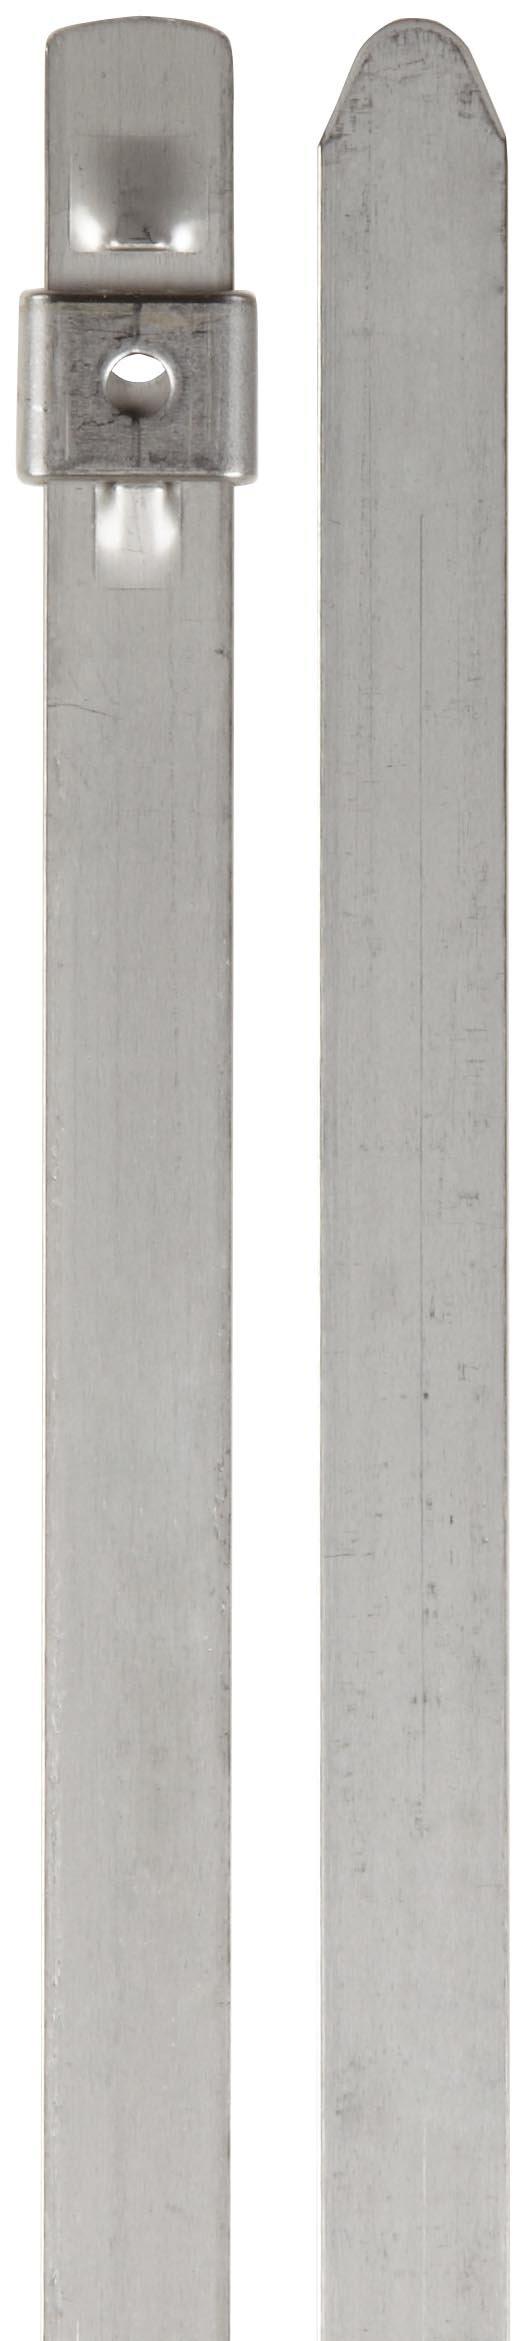 BAND-IT AS6239 Tie-Lok 304 Stainless Steel Cable Tie, 3/8'' Width, 17.5'' Length, 4'' Maximum Diameter, 100 per Bag